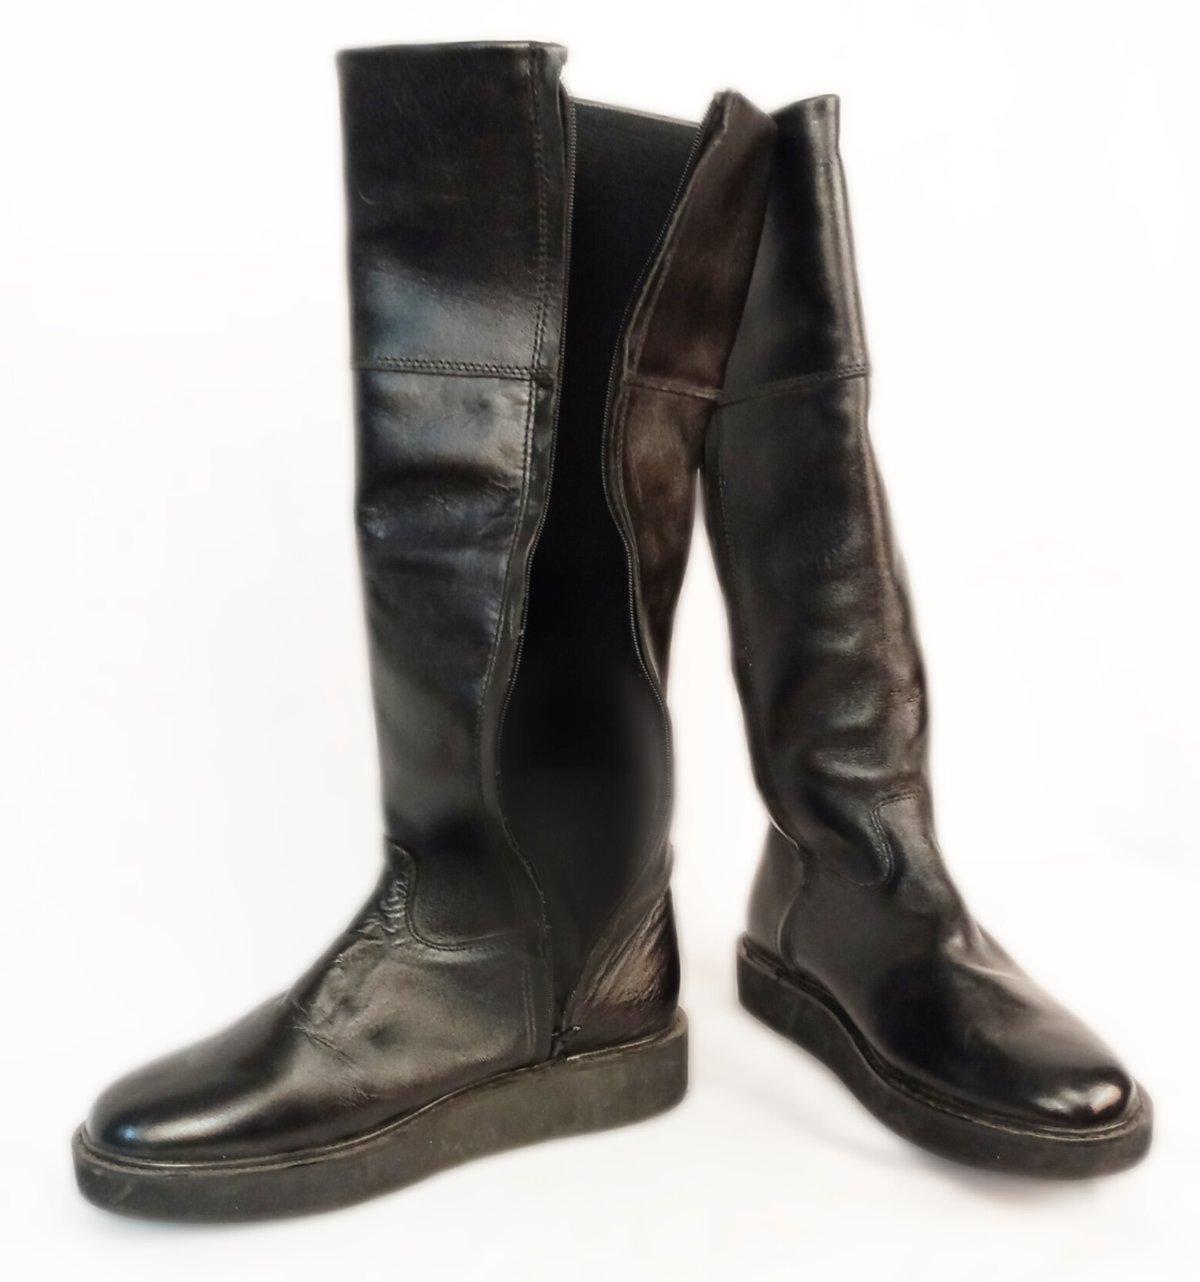 Image of #12 - B Grade from Stock - Shoe Size EU 41